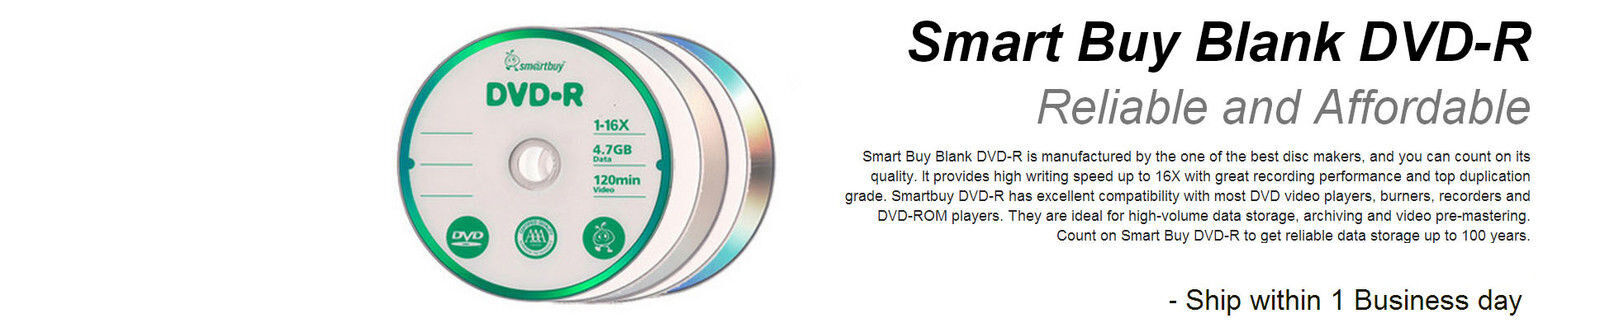 Smartbuy-Depot